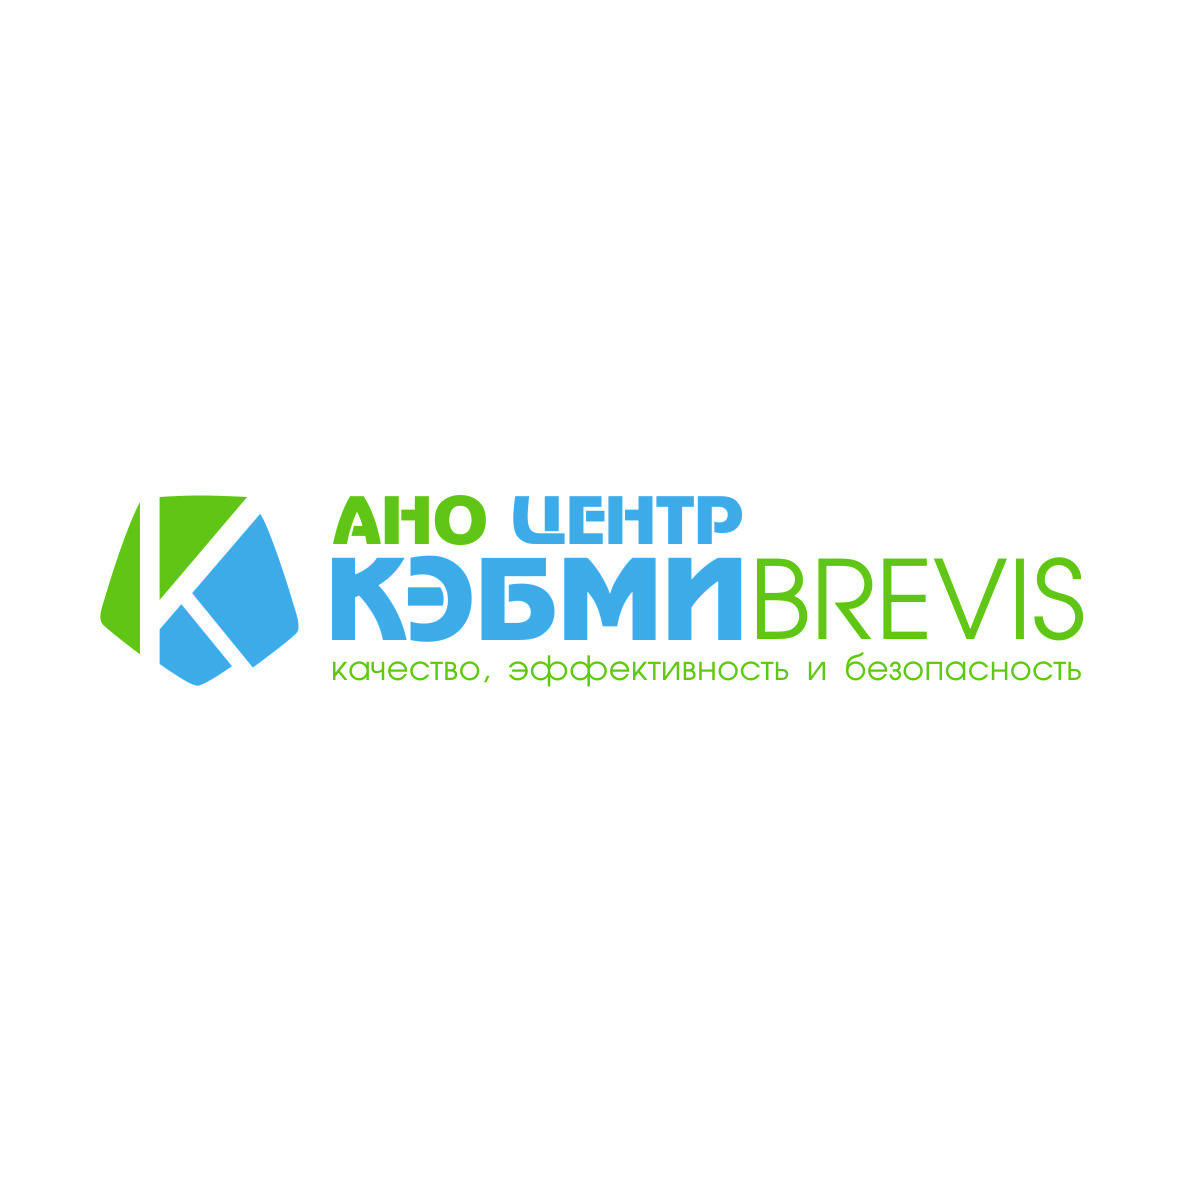 Редизайн логотипа АНО Центр КЭБМИ - BREVIS фото f_6815b2841ffe6710.jpg